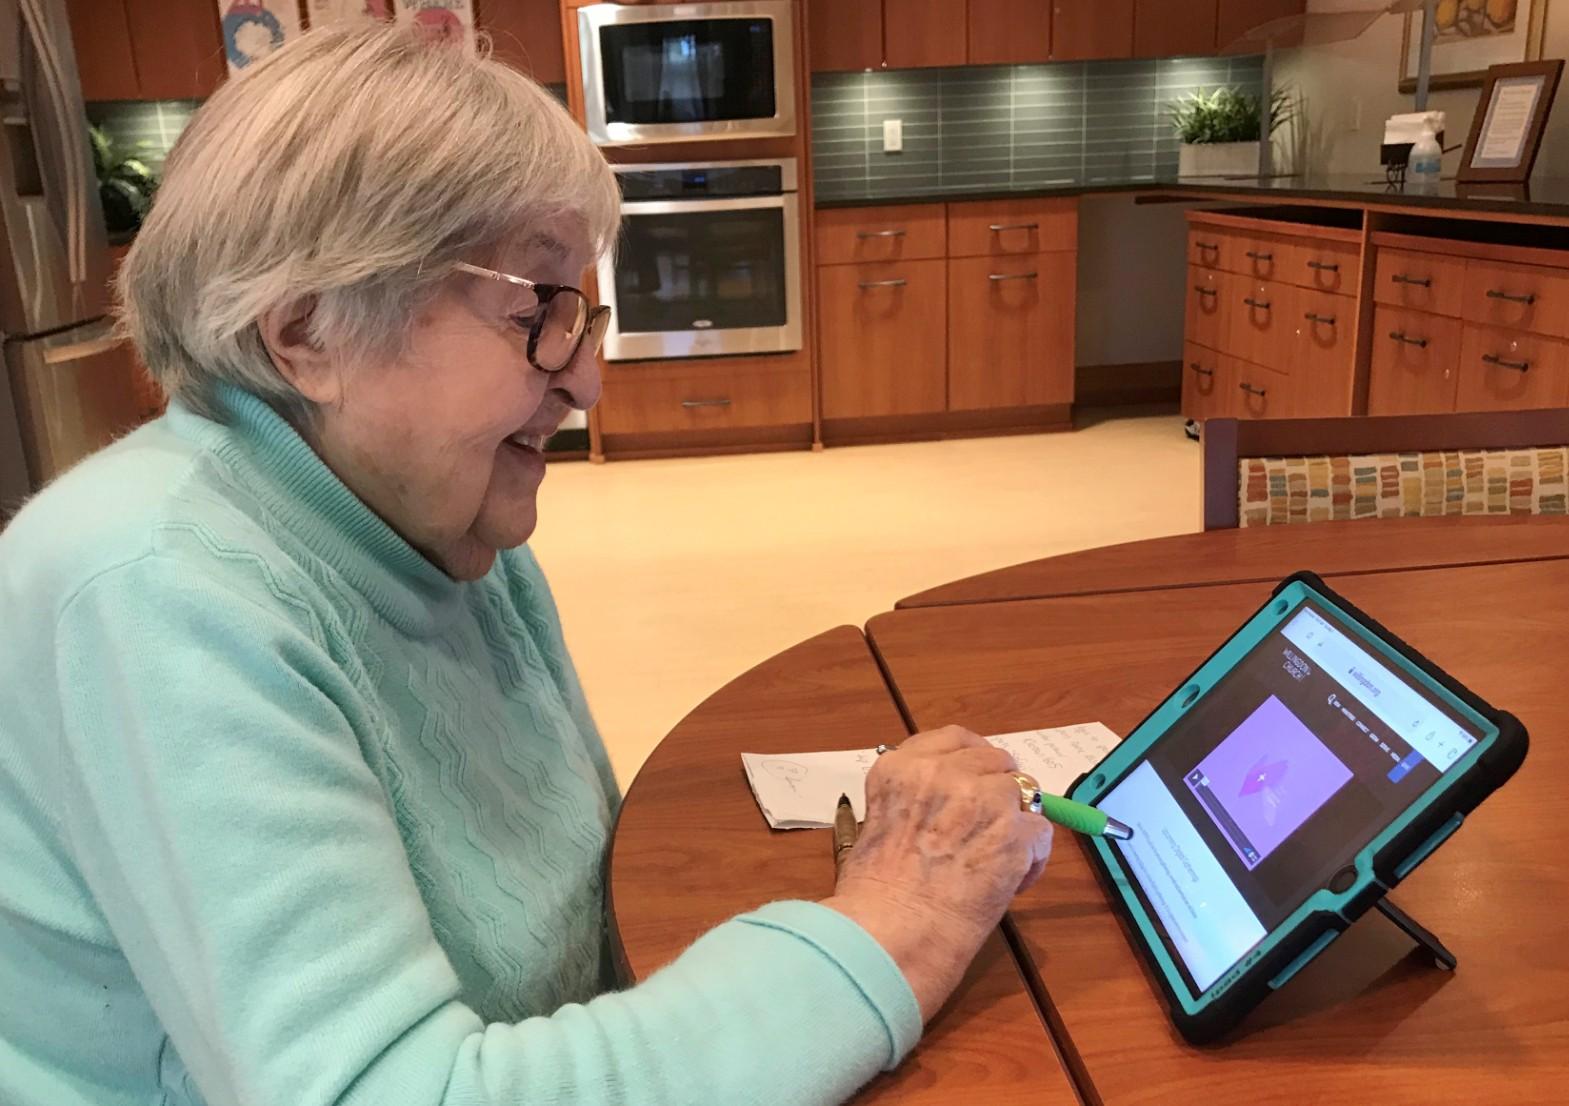 Summerhill PARC resident using tablet